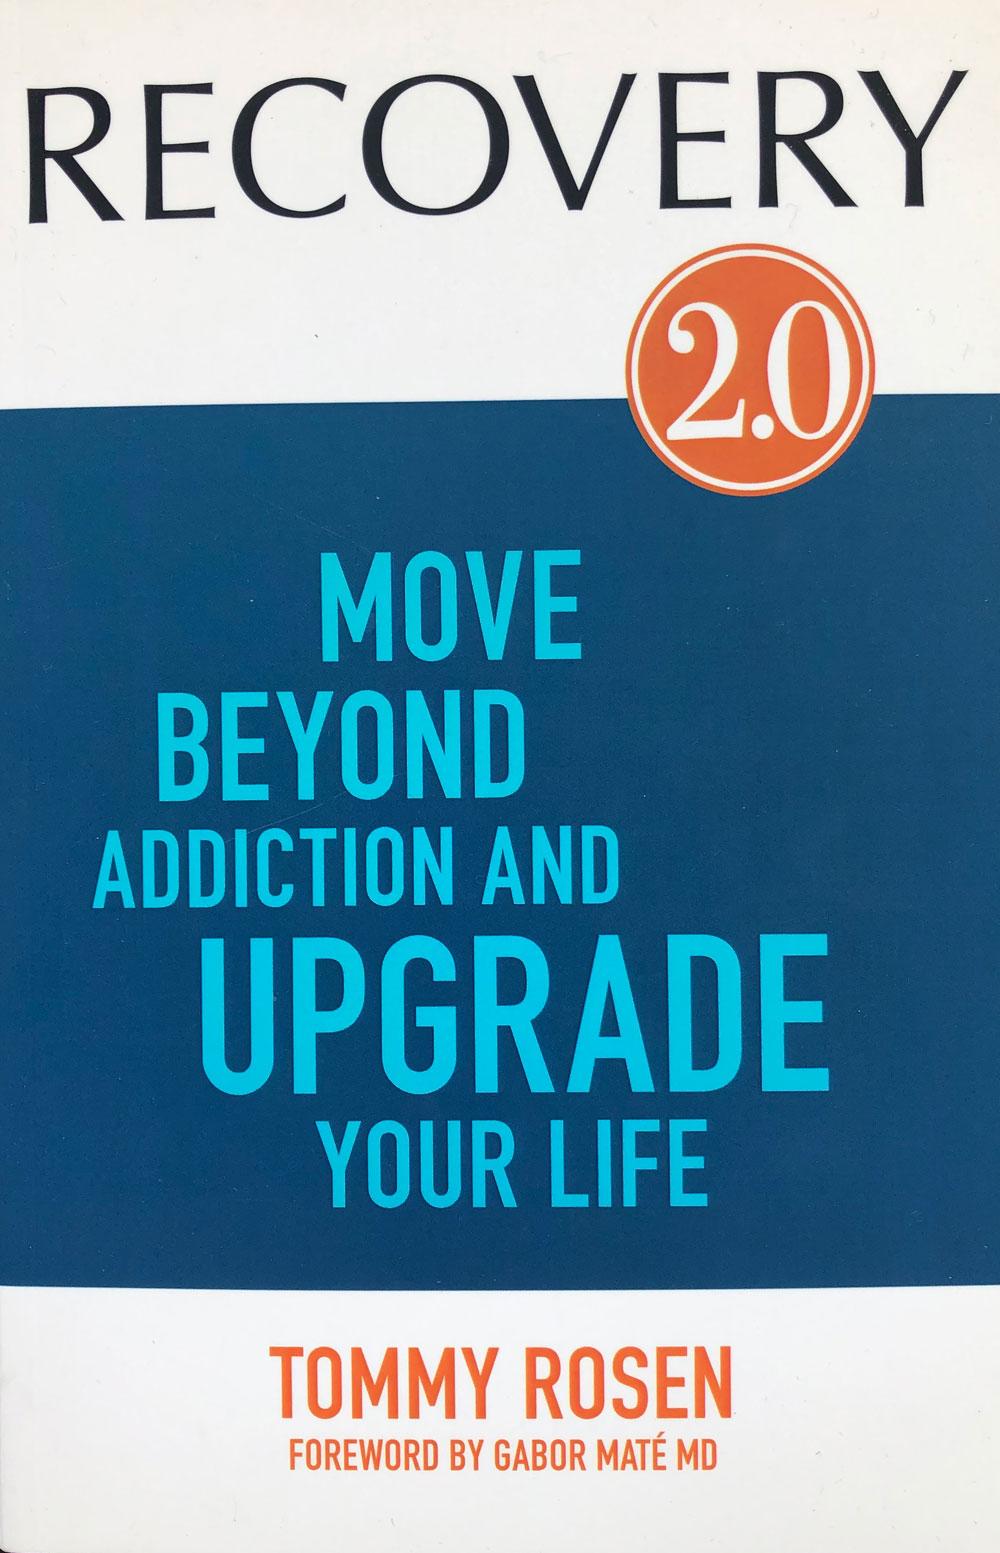 tommyrosen-recovery2.0-beyond-addiction-breathe.jpg